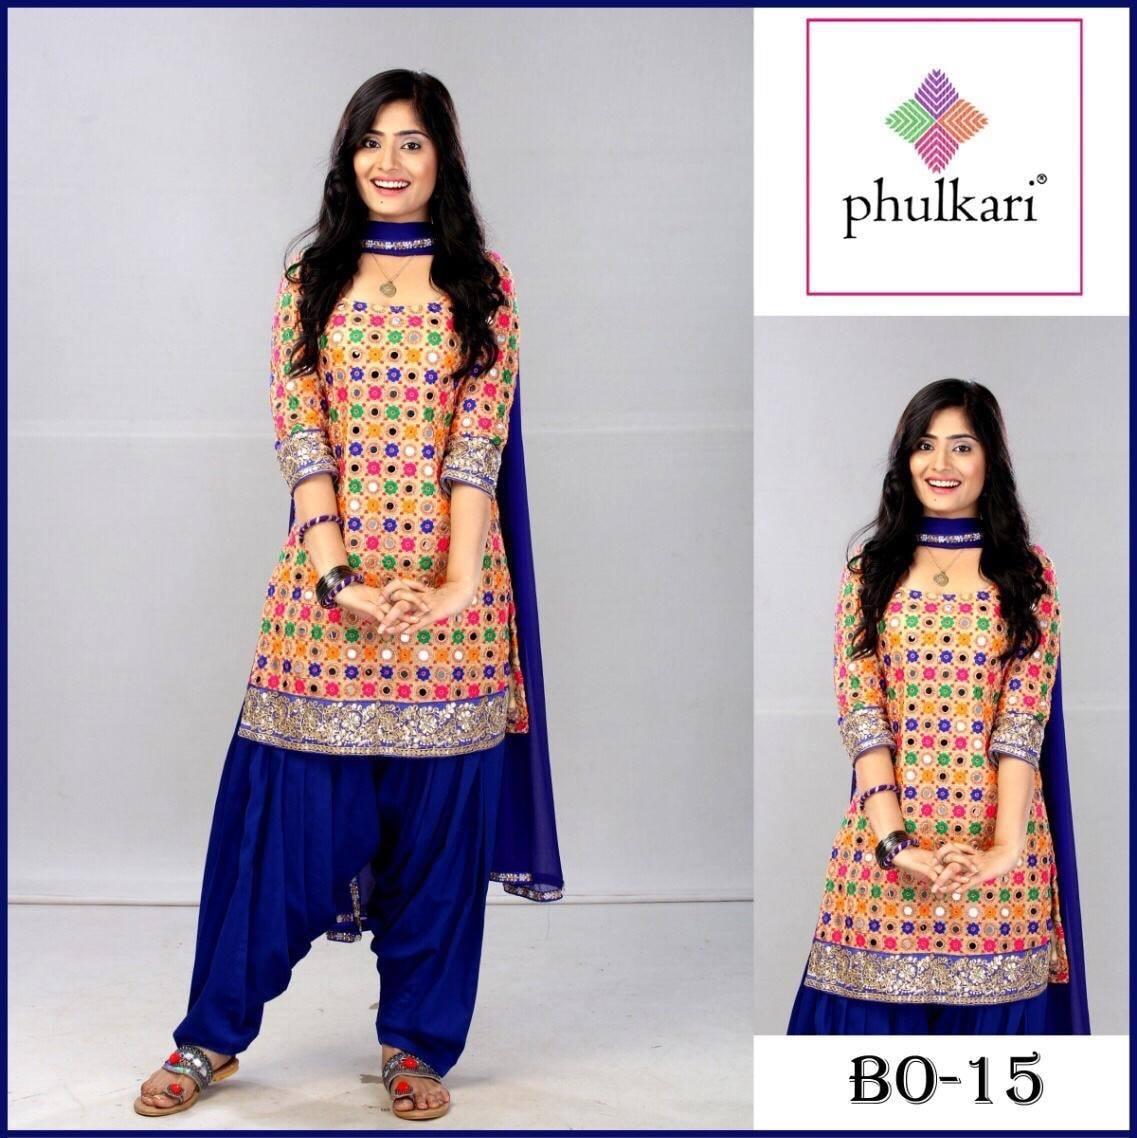 50bd084f56 Brand Phulkari Embroidered 2PC Lawn Dress - Unstitched - Rangeen Fashion